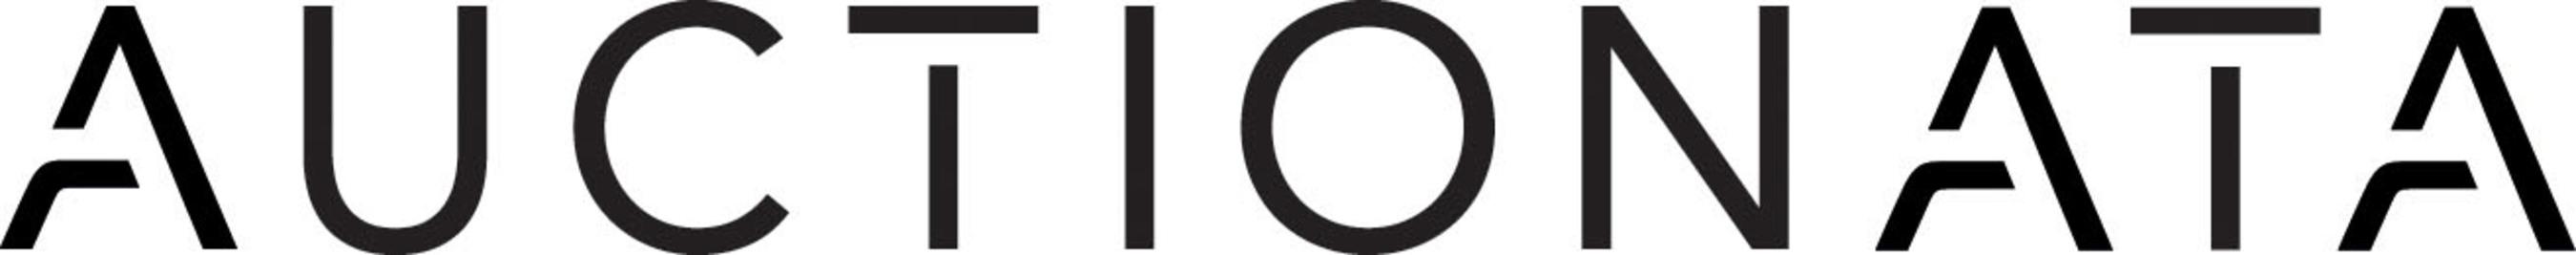 Auctionata Logo.